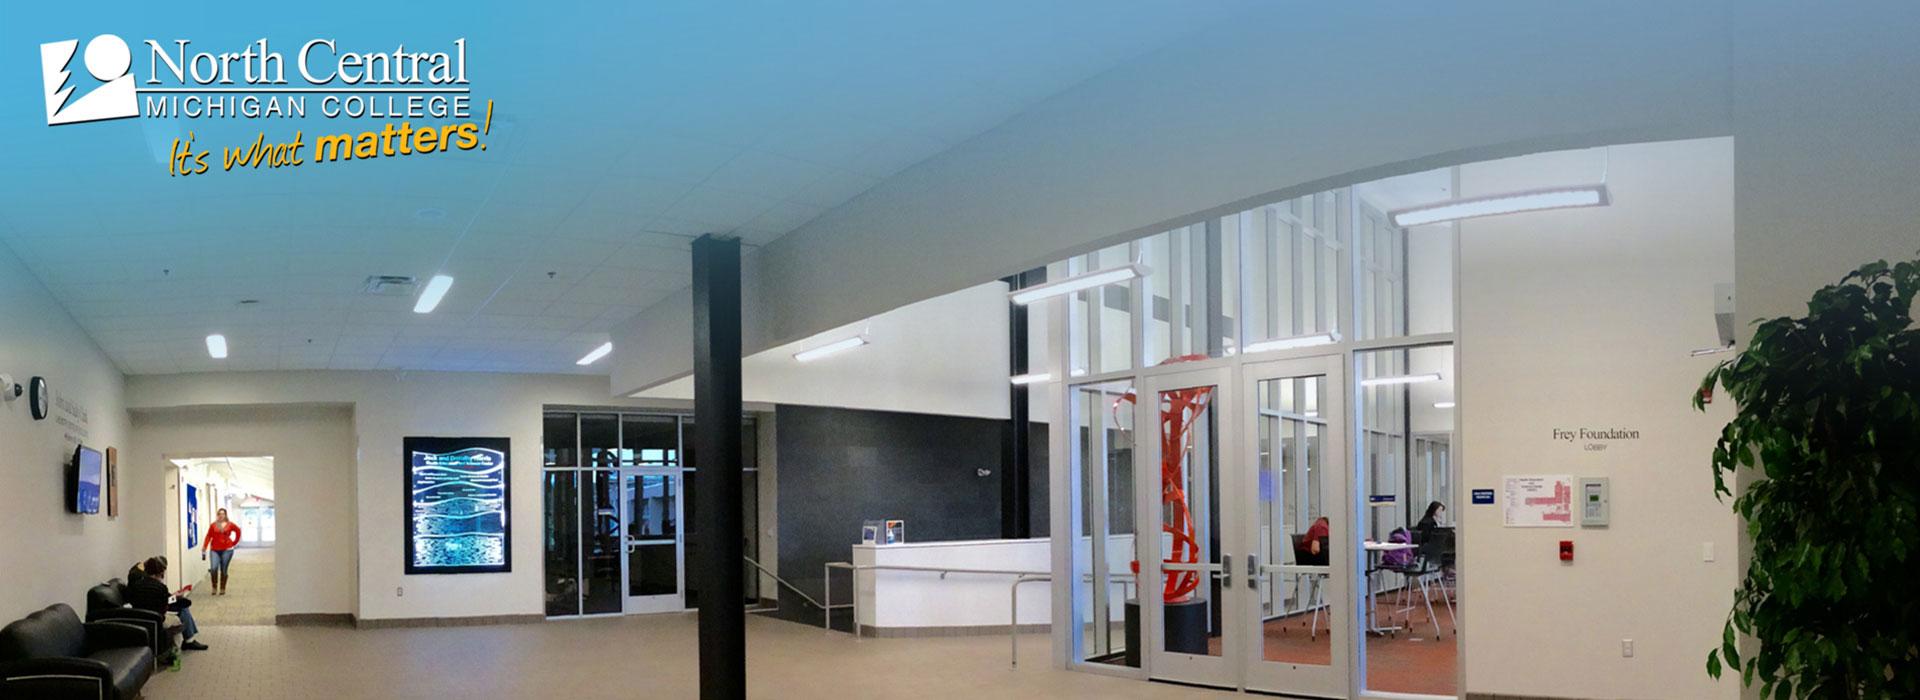 78 Michigan Interior Design Association